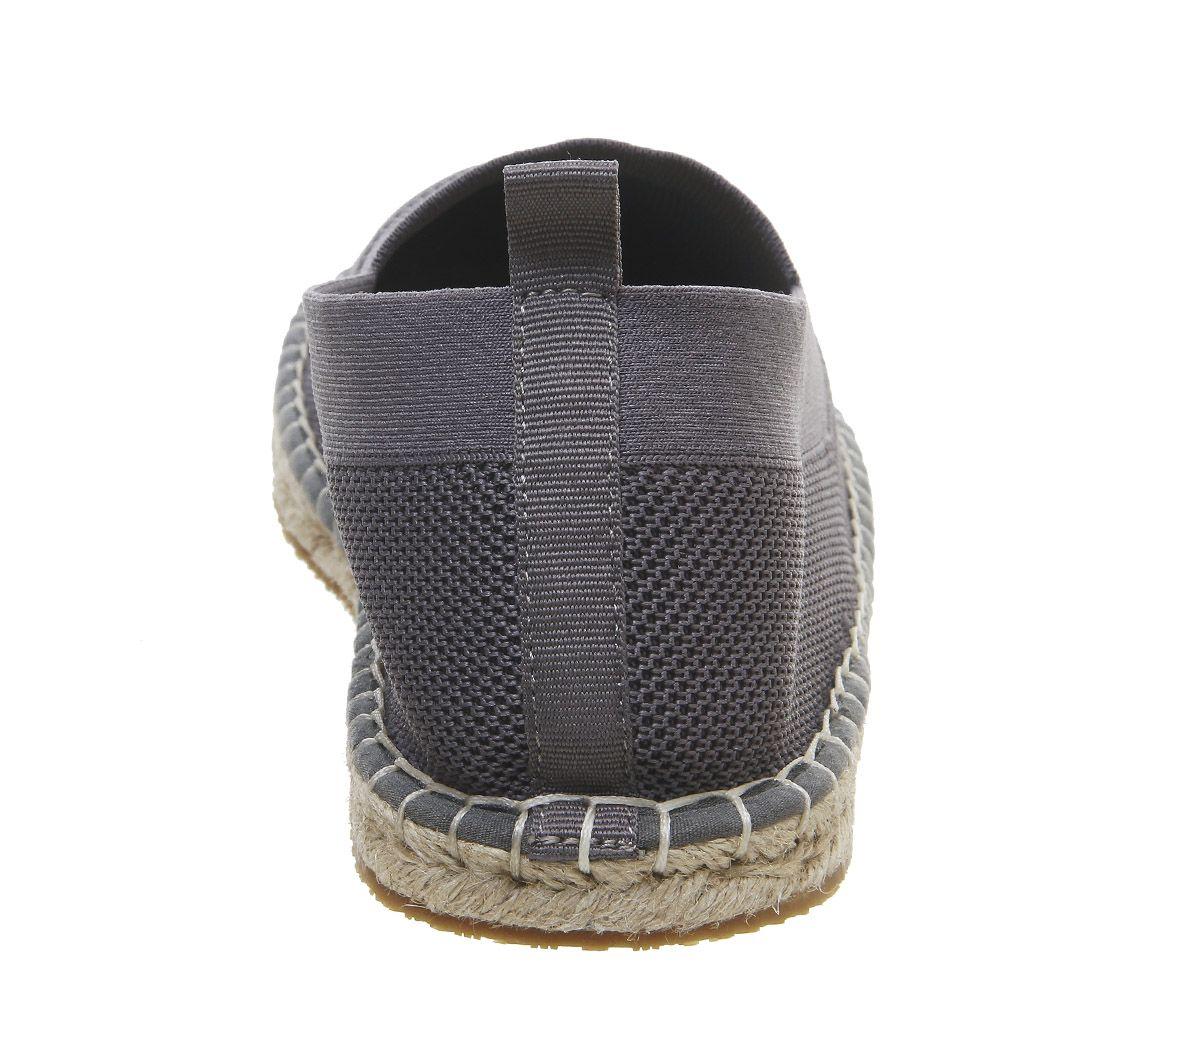 Mens-Office-Lombok-Knit-Espadrilles-Grey-Casual-Shoes thumbnail 4